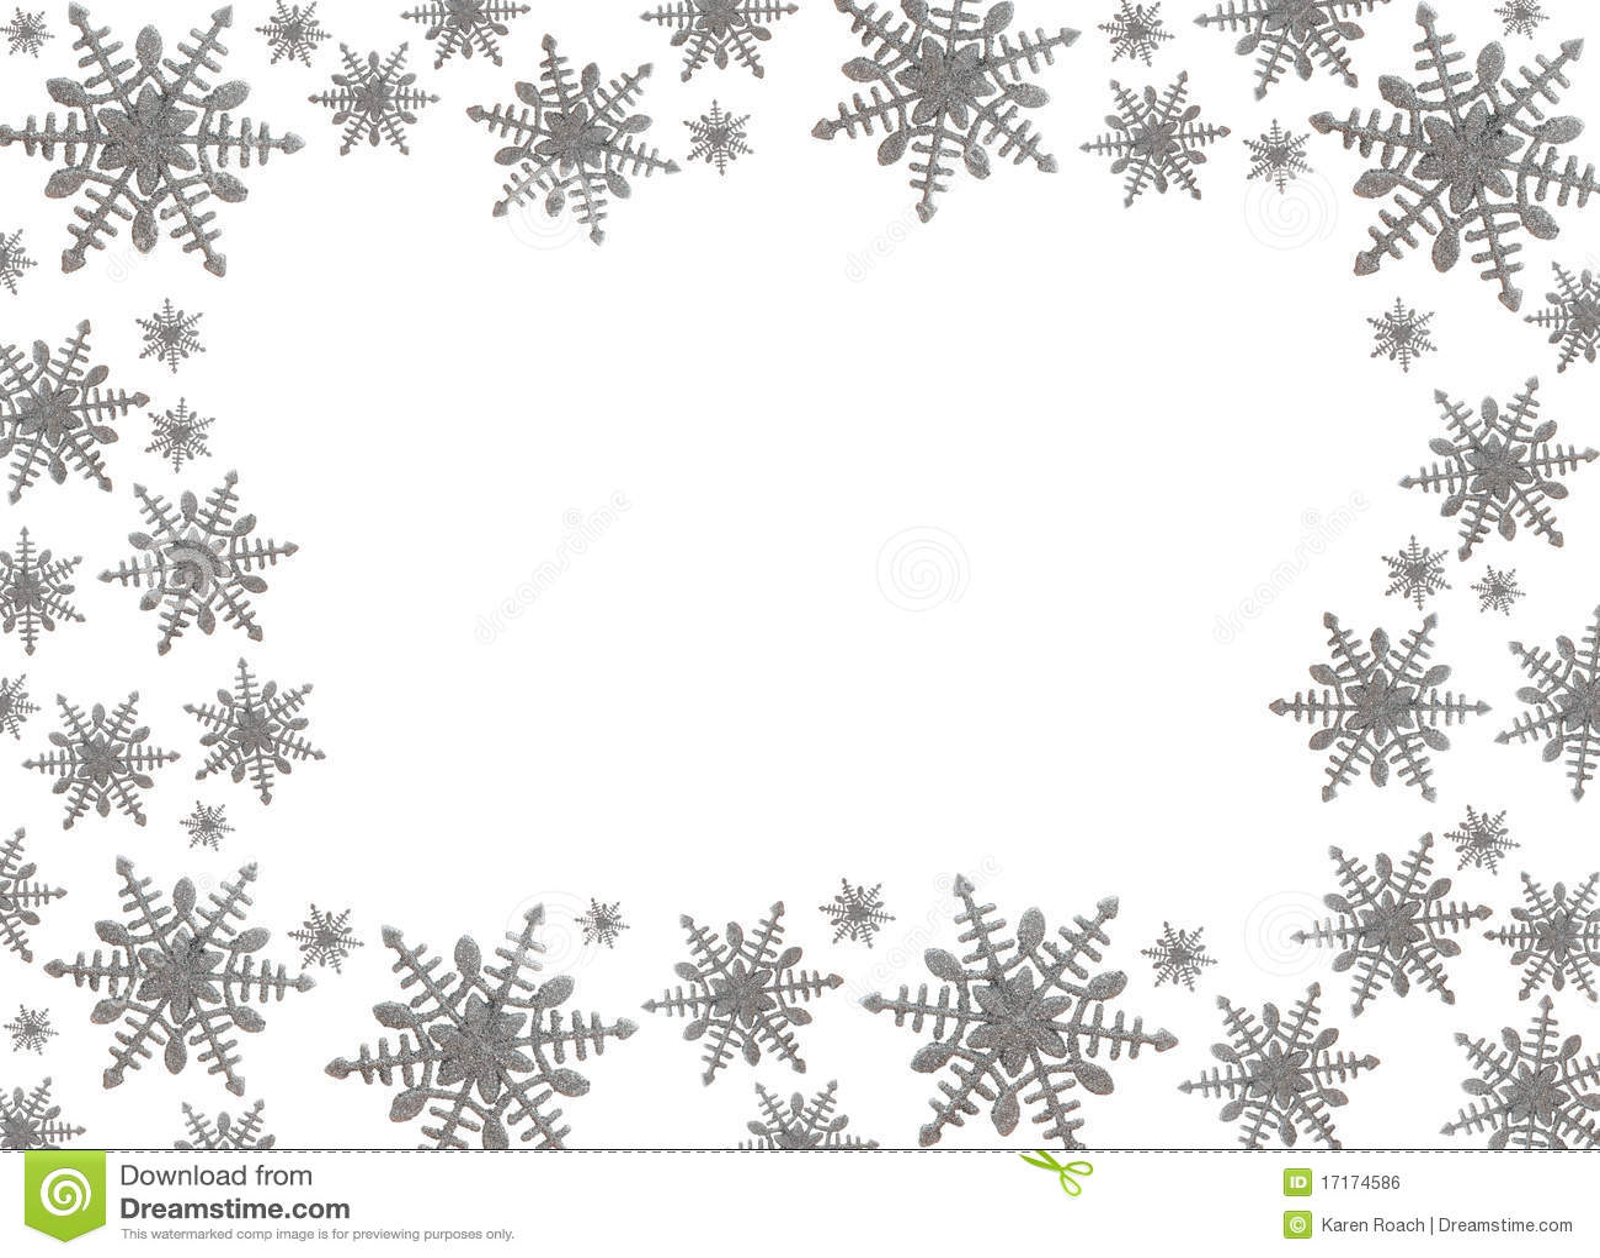 snowflake border stock photo image of blue overwhite